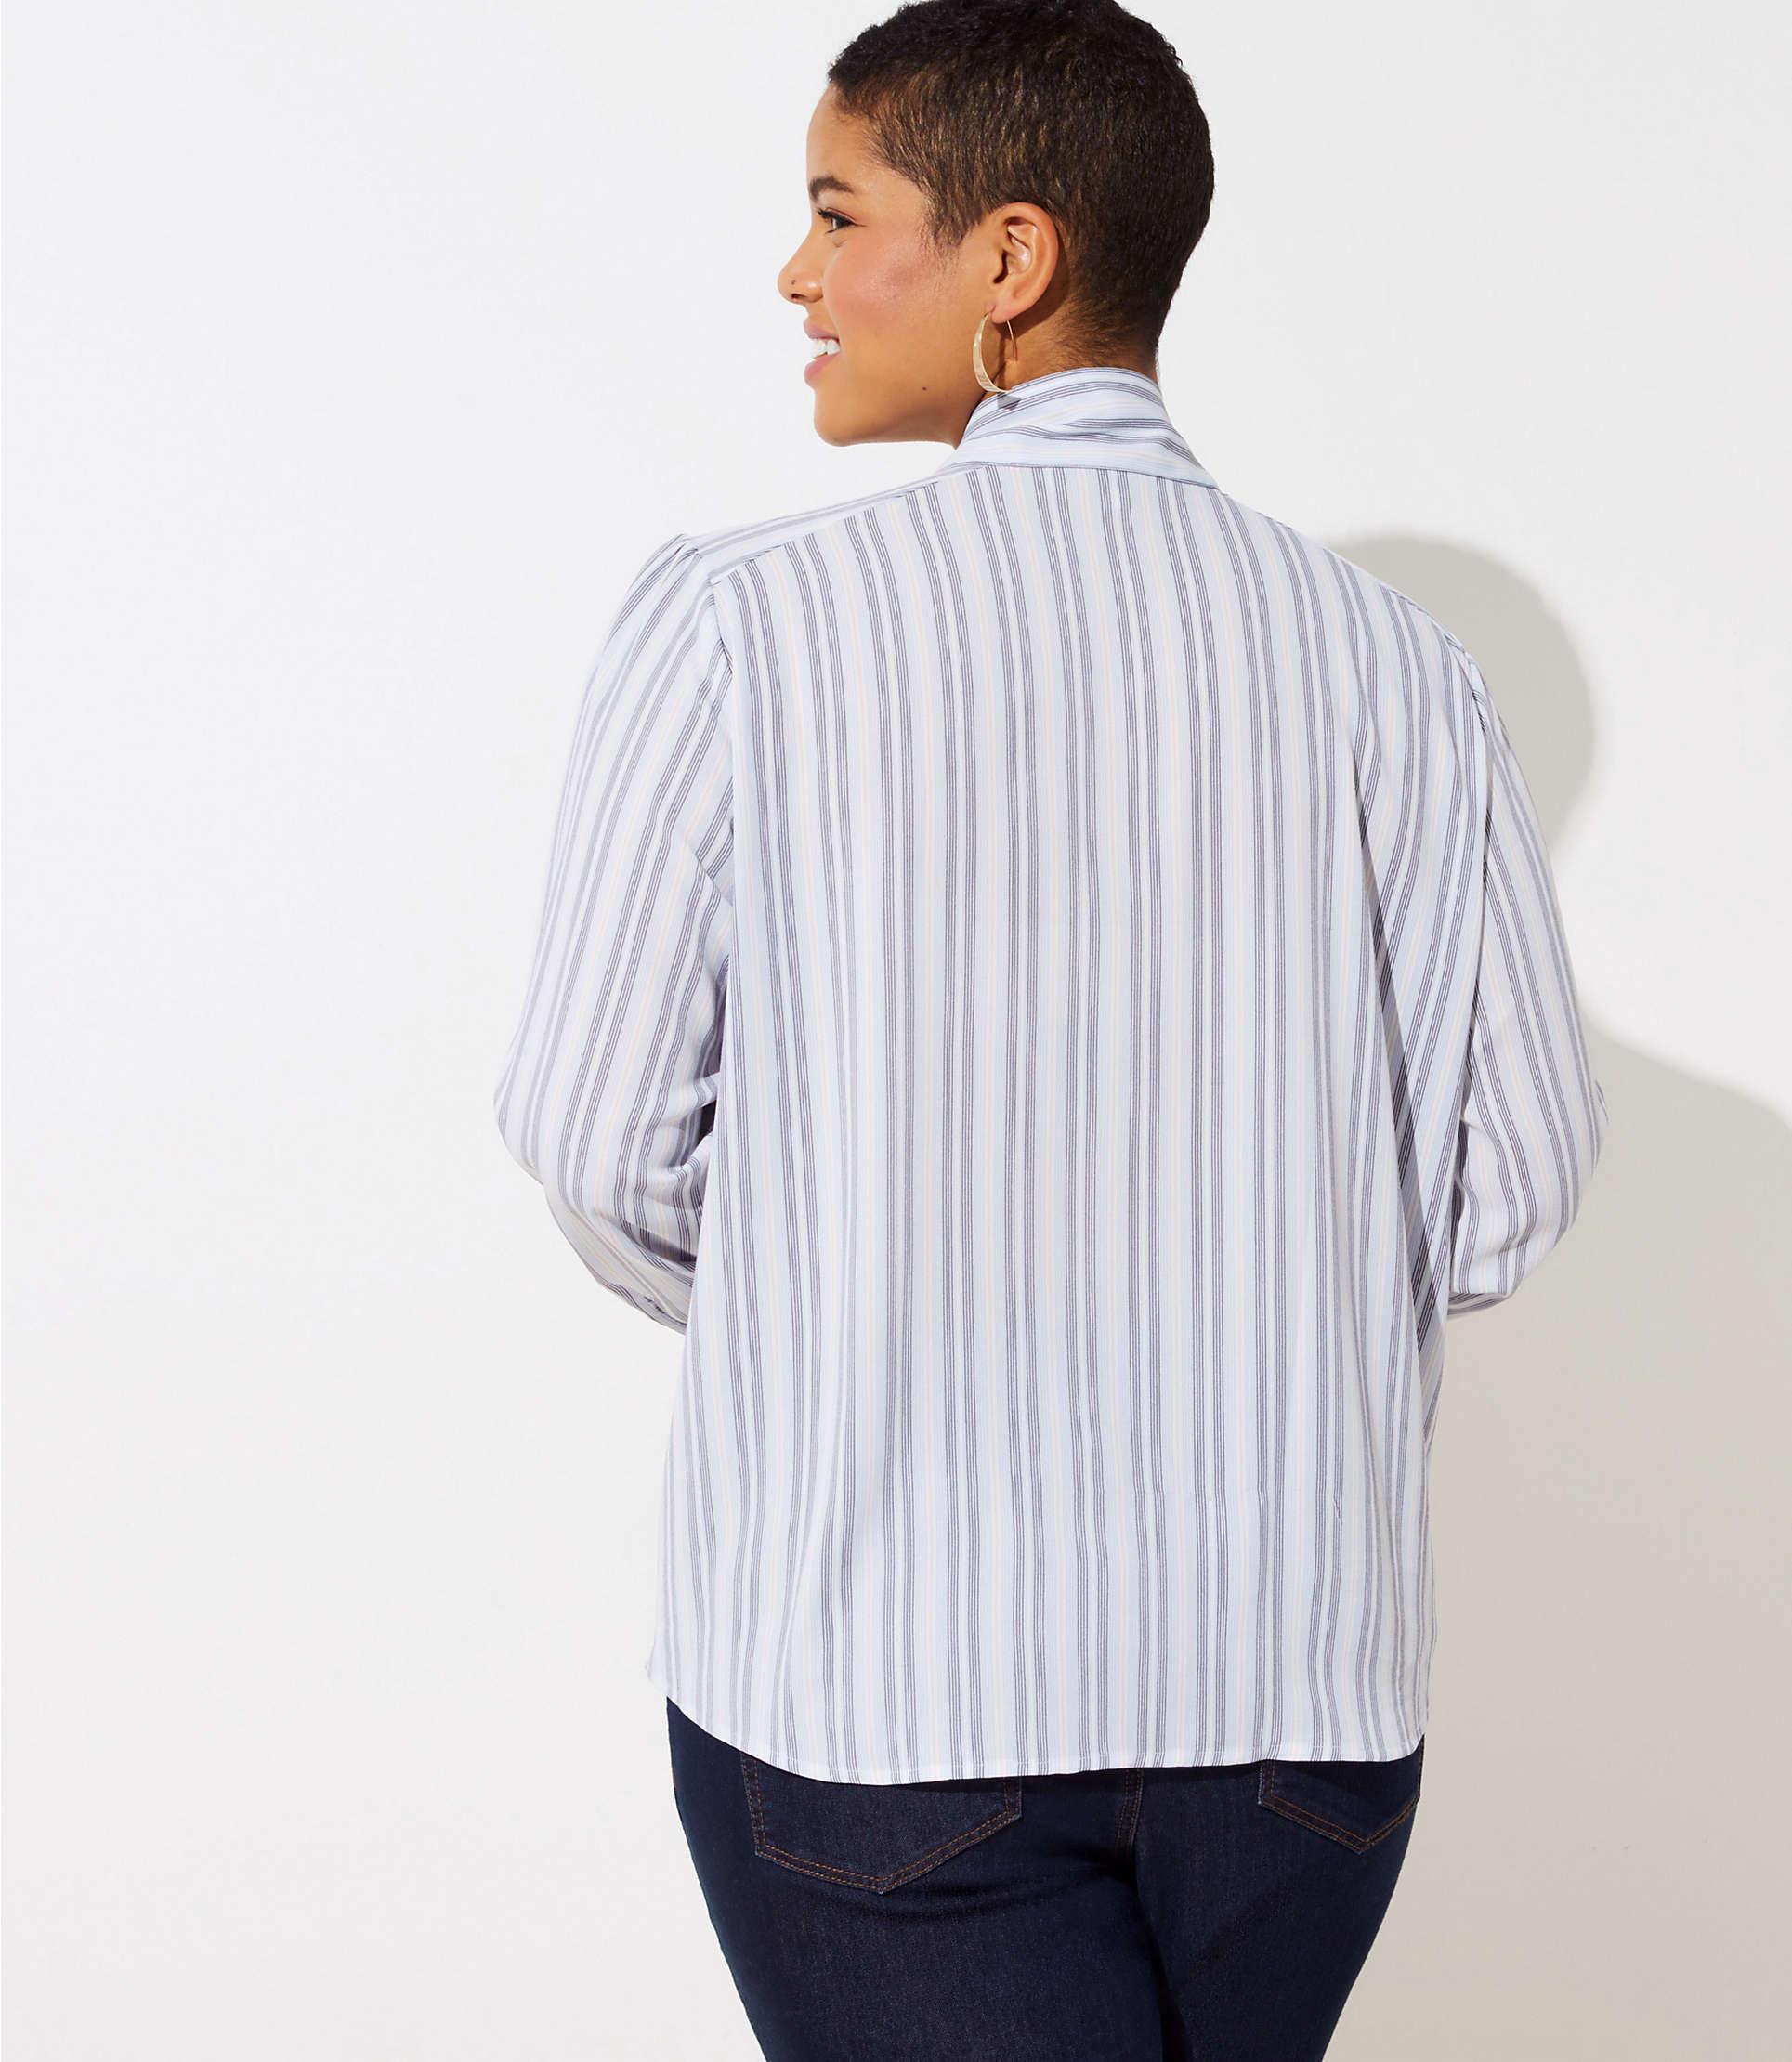 7e159a3c28abb LOFT - Multicolor Plus Striped Tie Neck Blouse - Lyst. View fullscreen